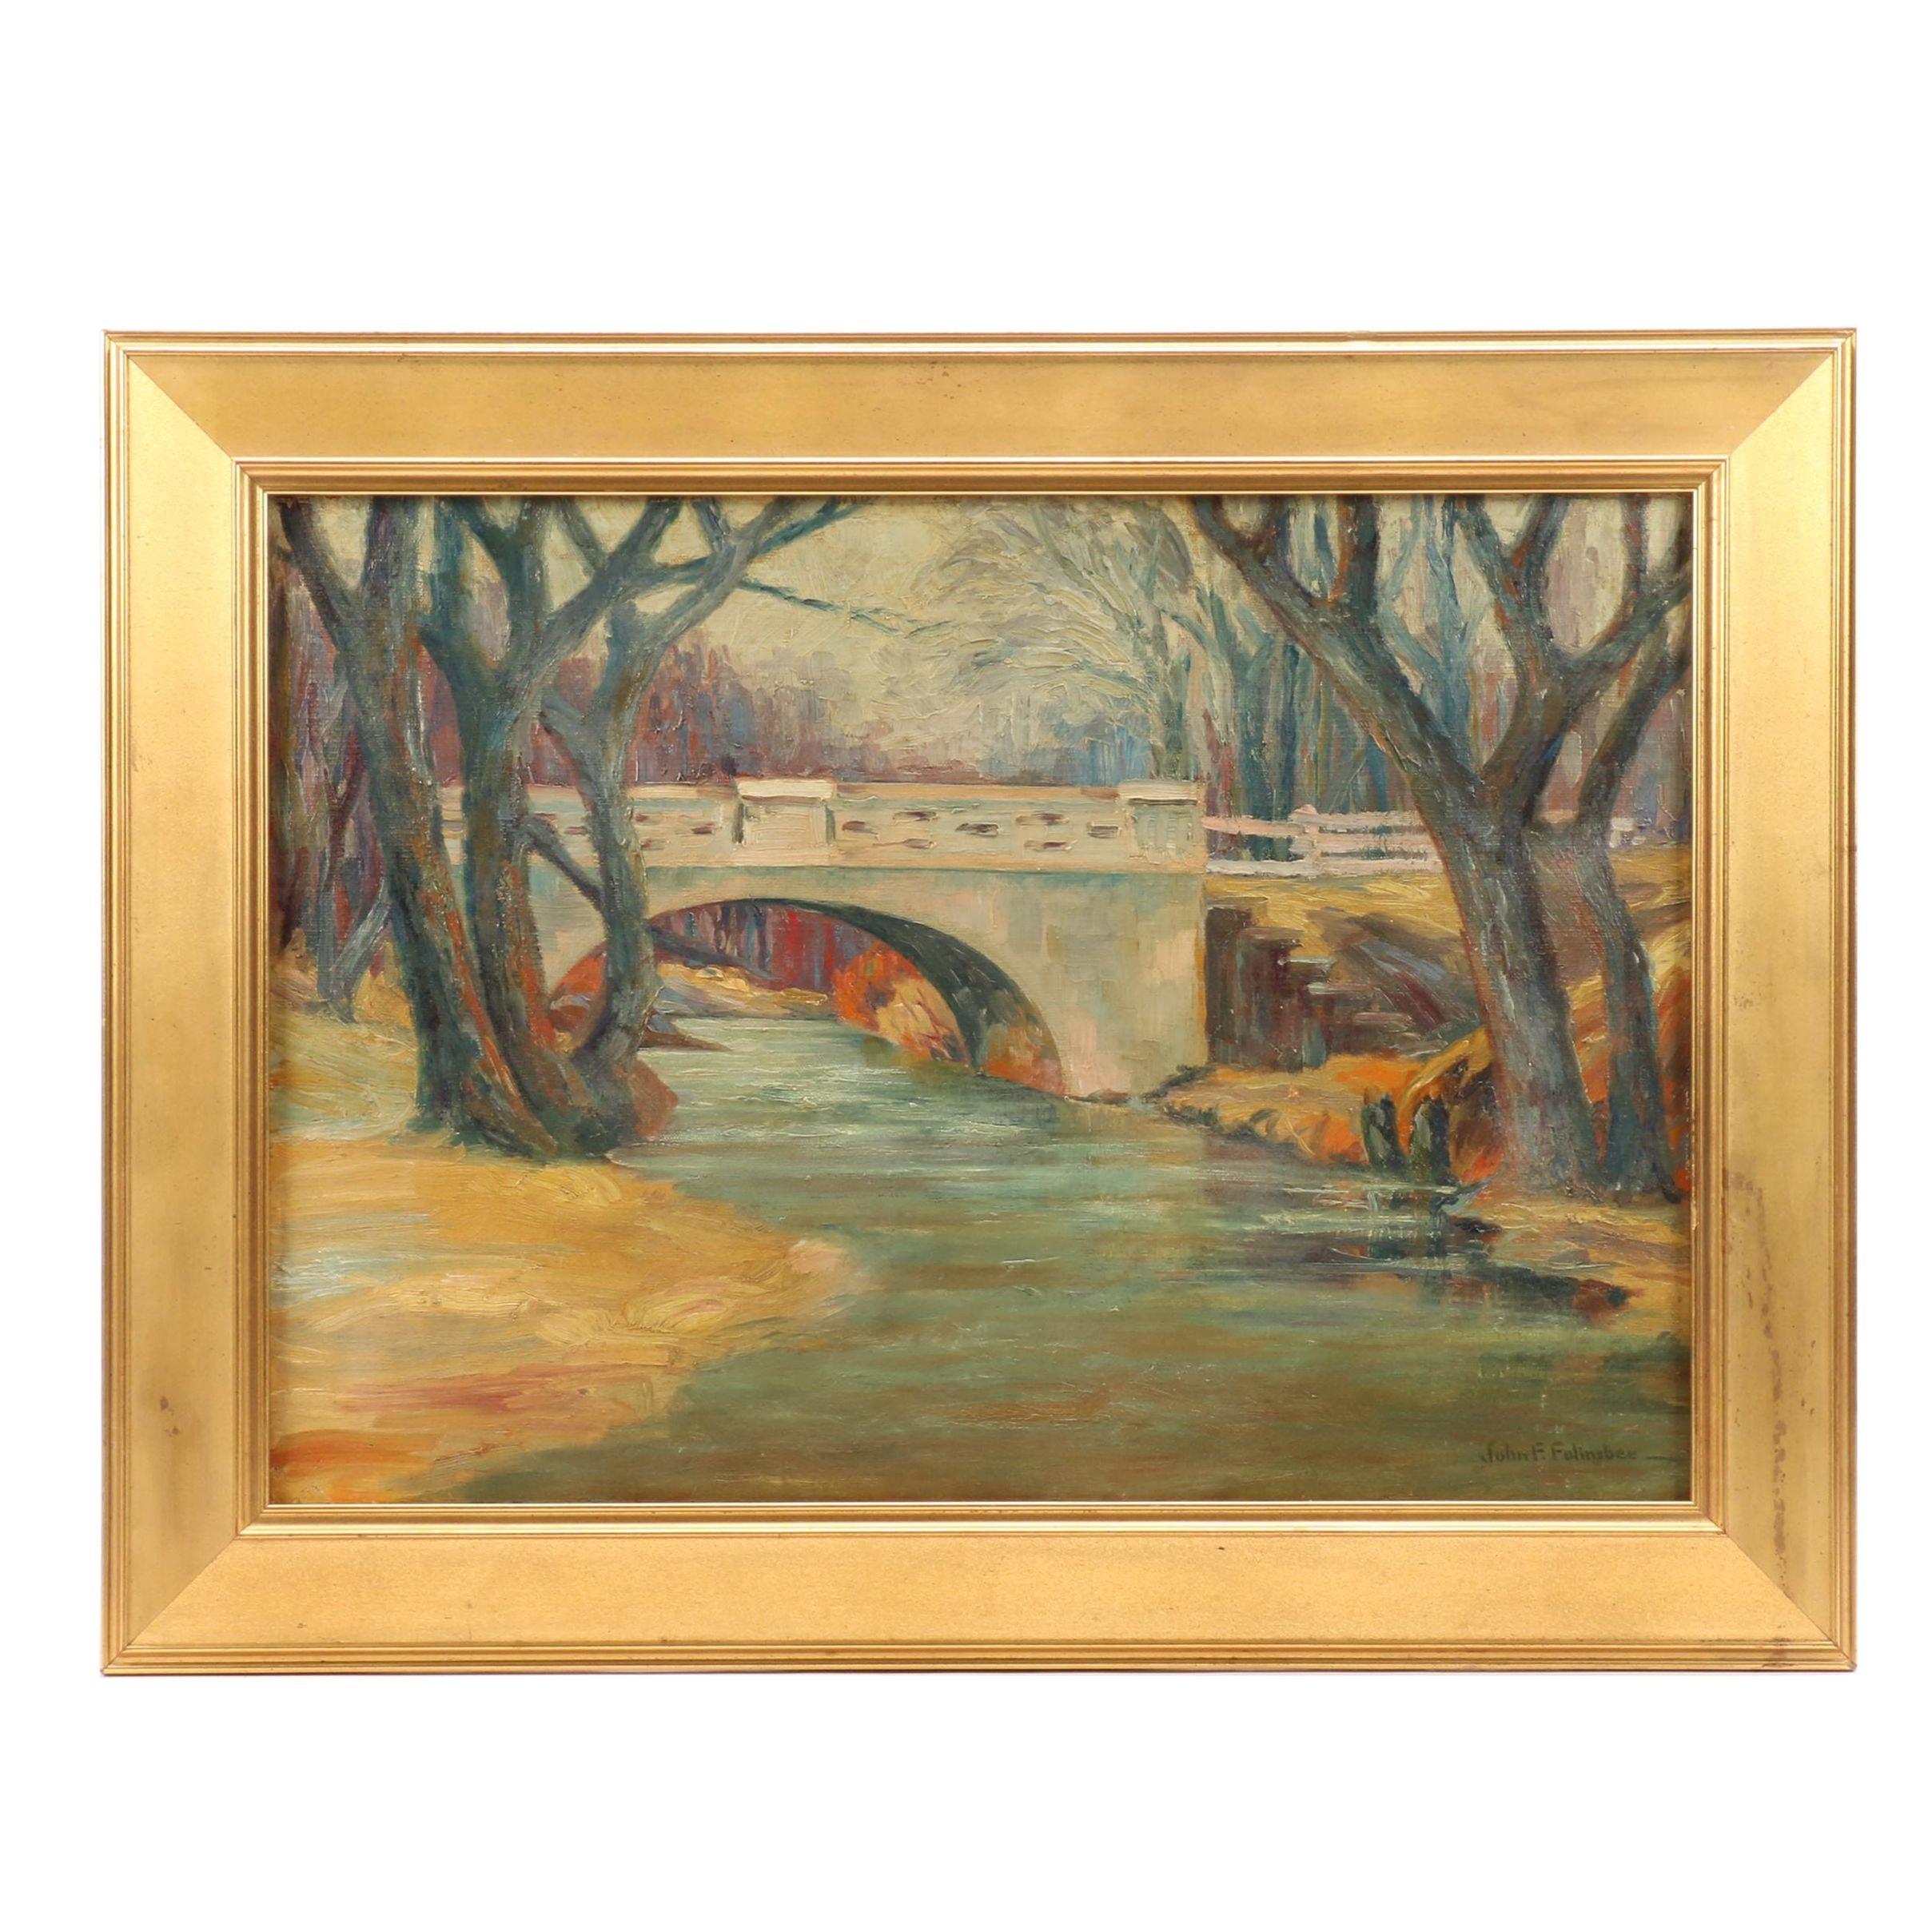 John Folinsbee Oil Painting of River Scene with Bridge